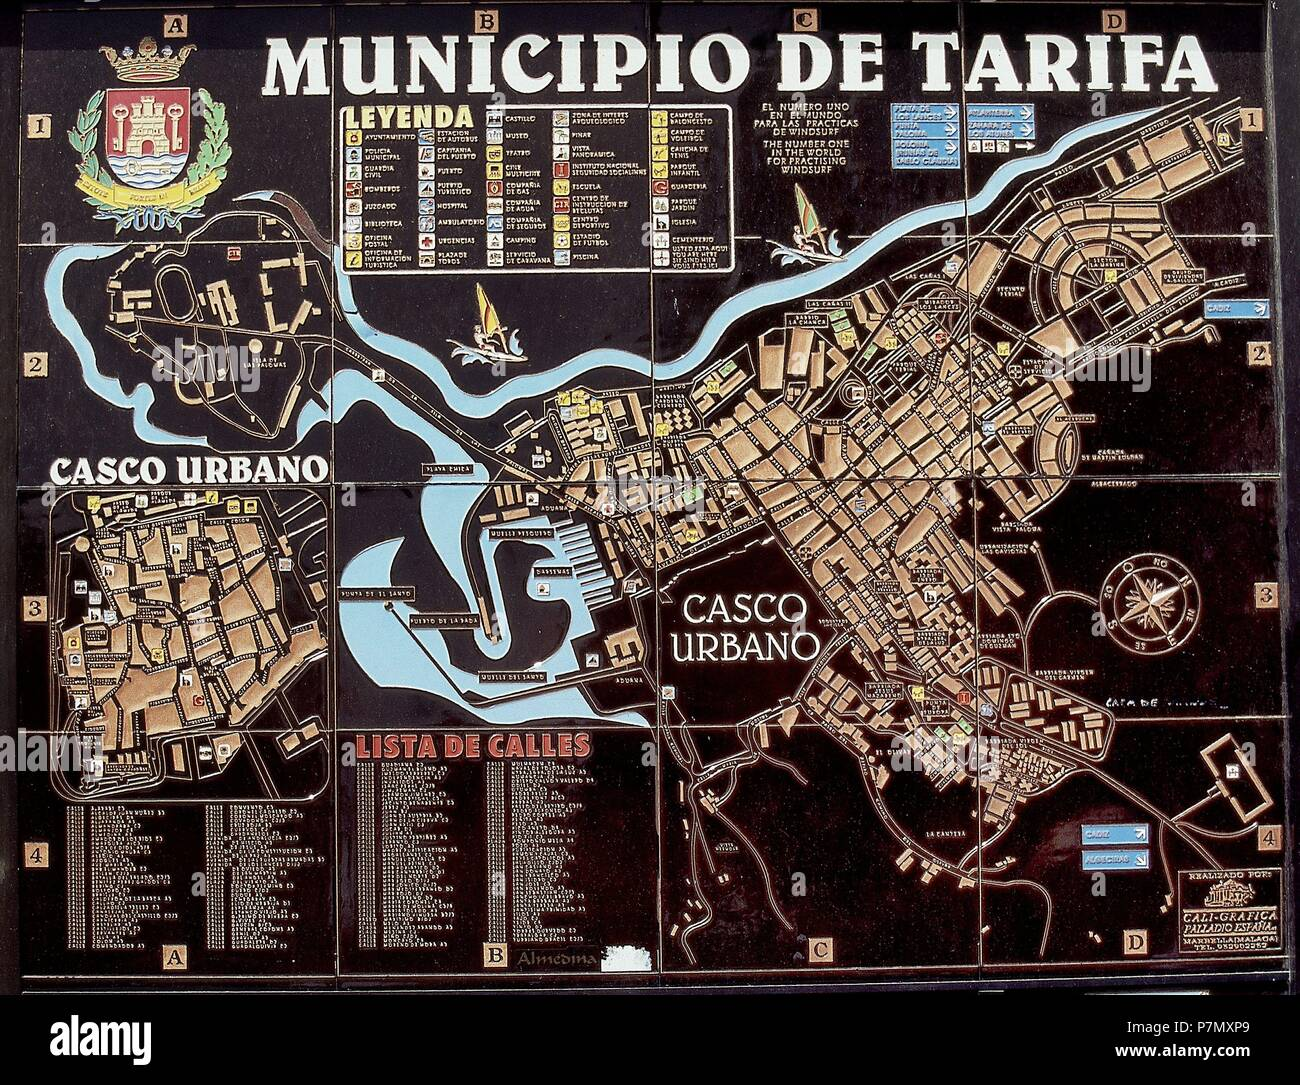 Mapa De Tarifa Cadiz.Plano Del Municipio De Tarifa Location Exterior Cadiz Spain Stock Photo Alamy